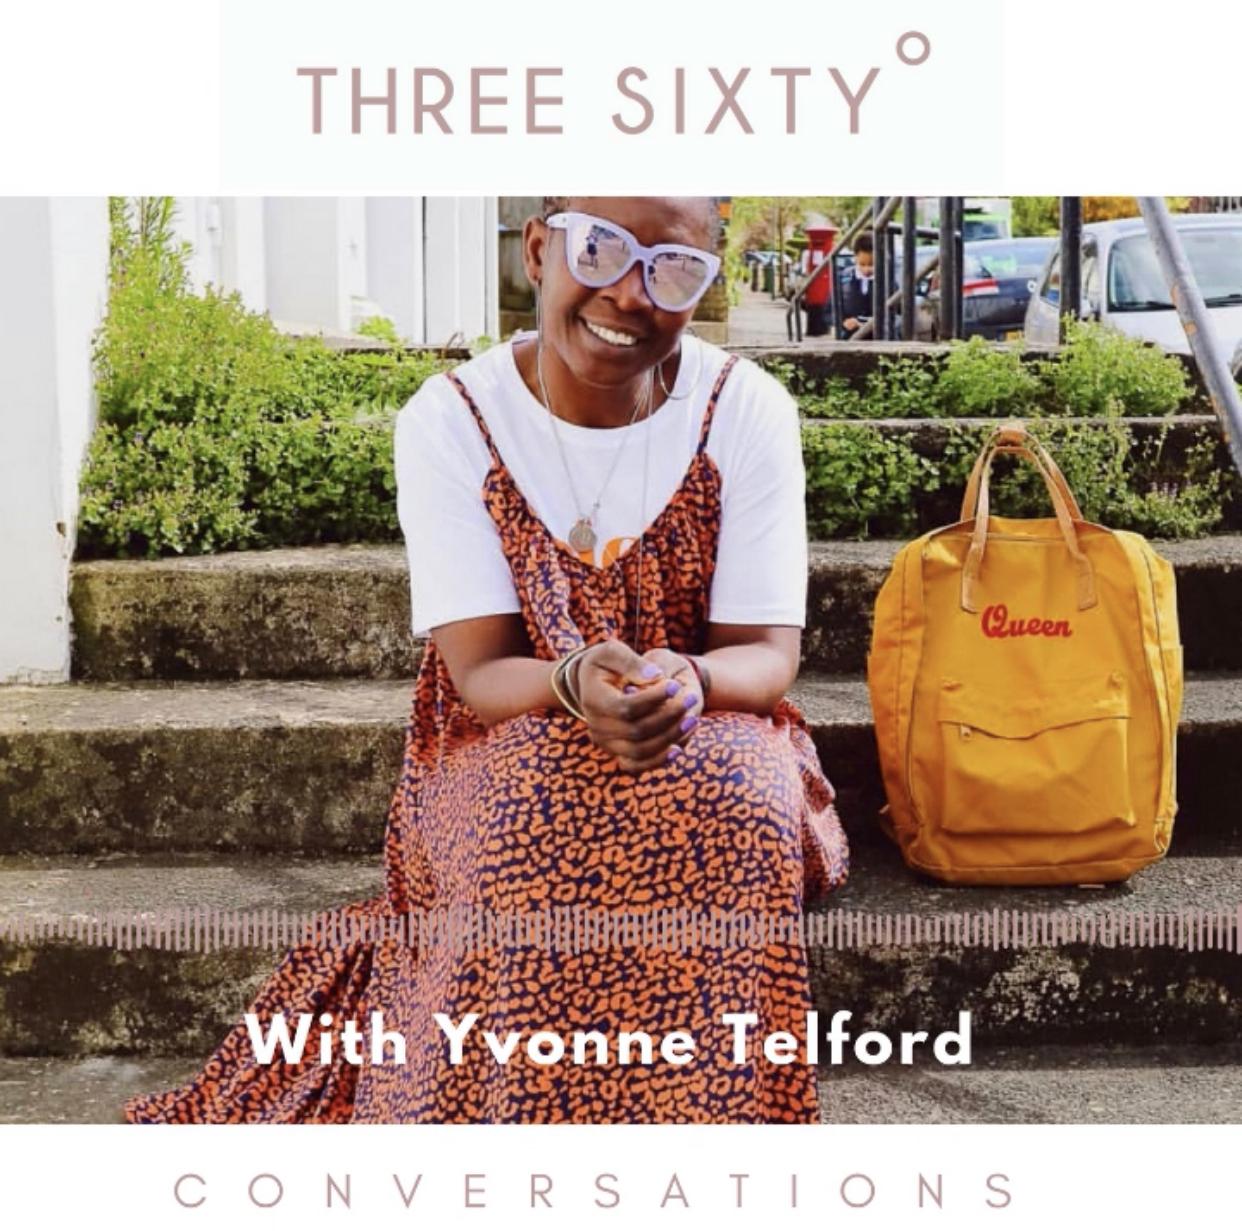 Yvonne Telford, Kemi Telford, Kemi kids, Nigerian proverbs, Live Three Sixty, Tamu Thomas, 40+, apple podcasts, Spotify podcast, podcasts of colour, female founder, WOC founder